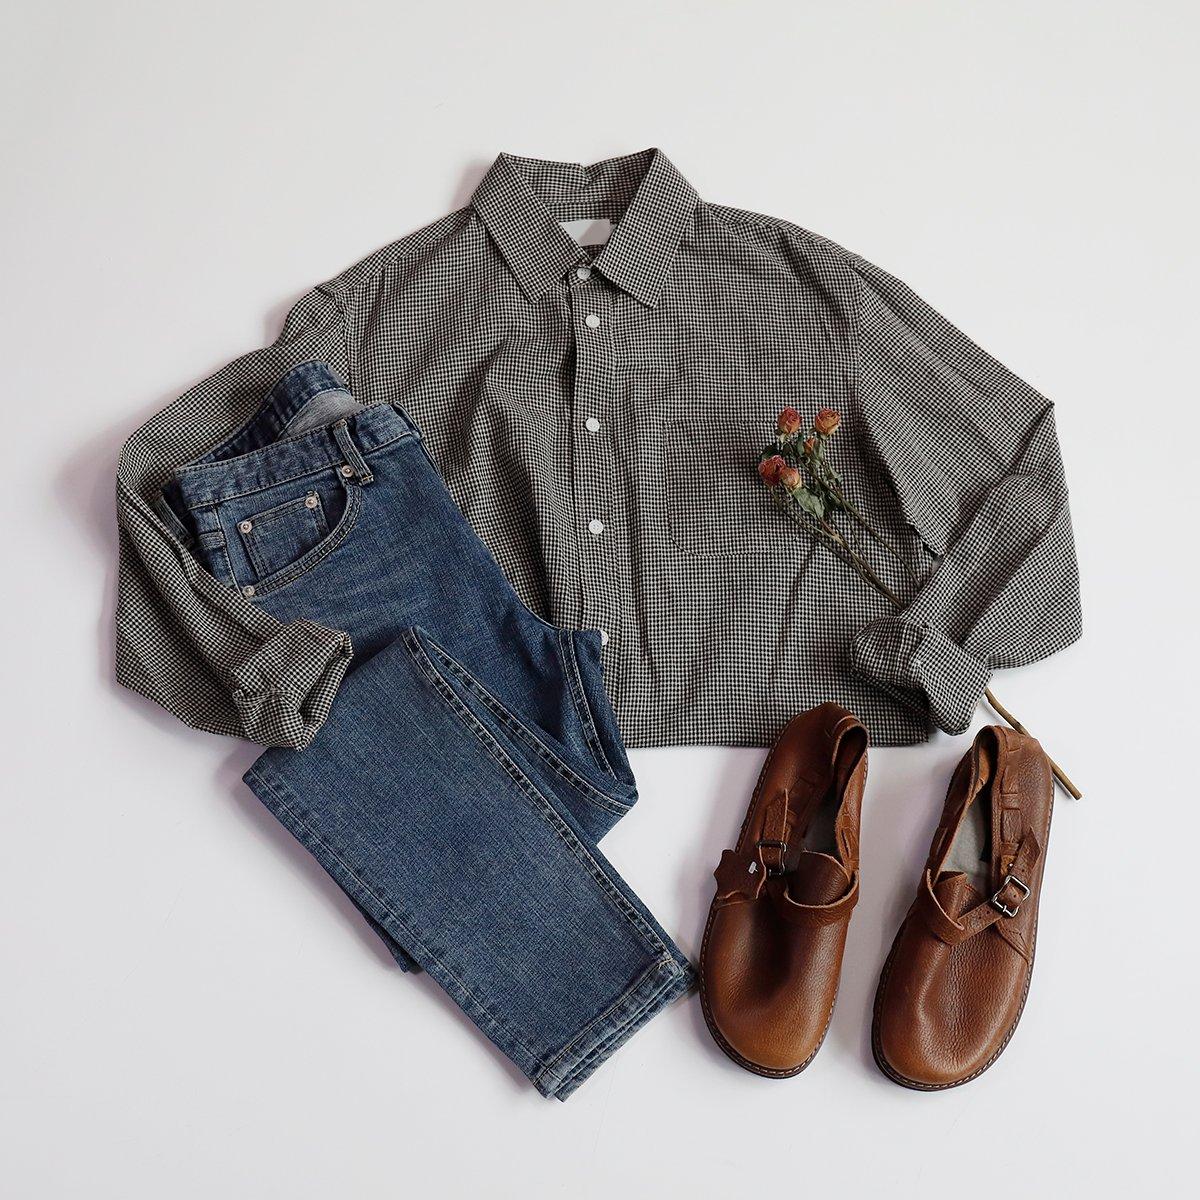 230fc19ec79 안녕하세요 :) 옷누나에요 오늘은 여자의 마음을 사로 잡을 수 있는 심쿵! 남자 봄 셔츠 코디 준비해봤어요!